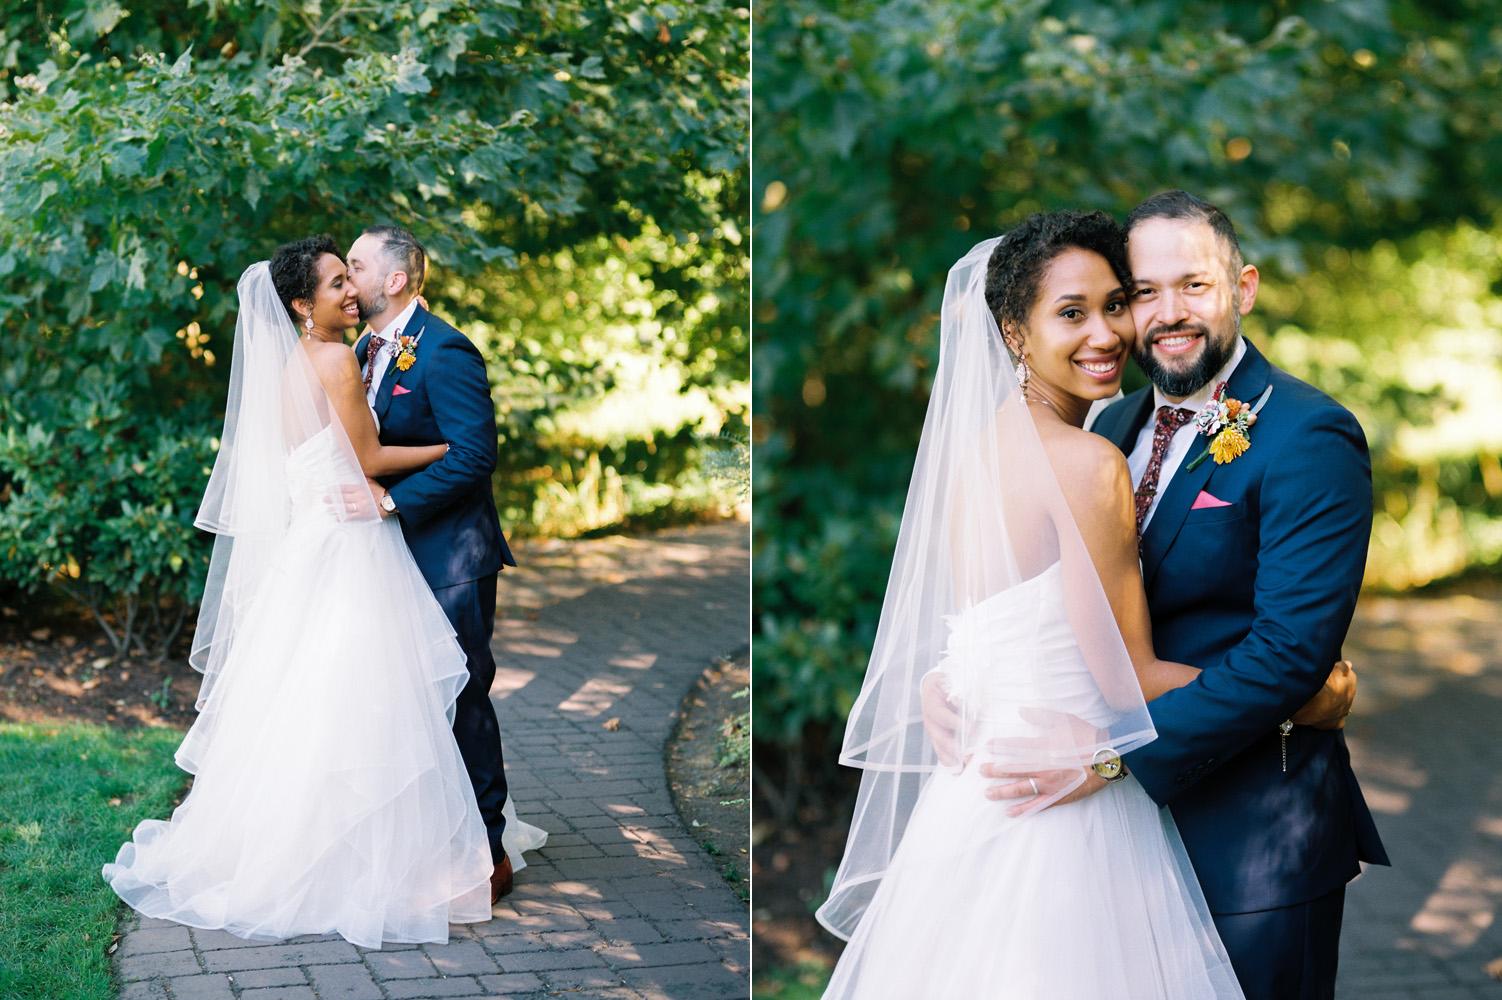 Seattle Bride and Groom Pickering Barn Wedding Photography.jpg